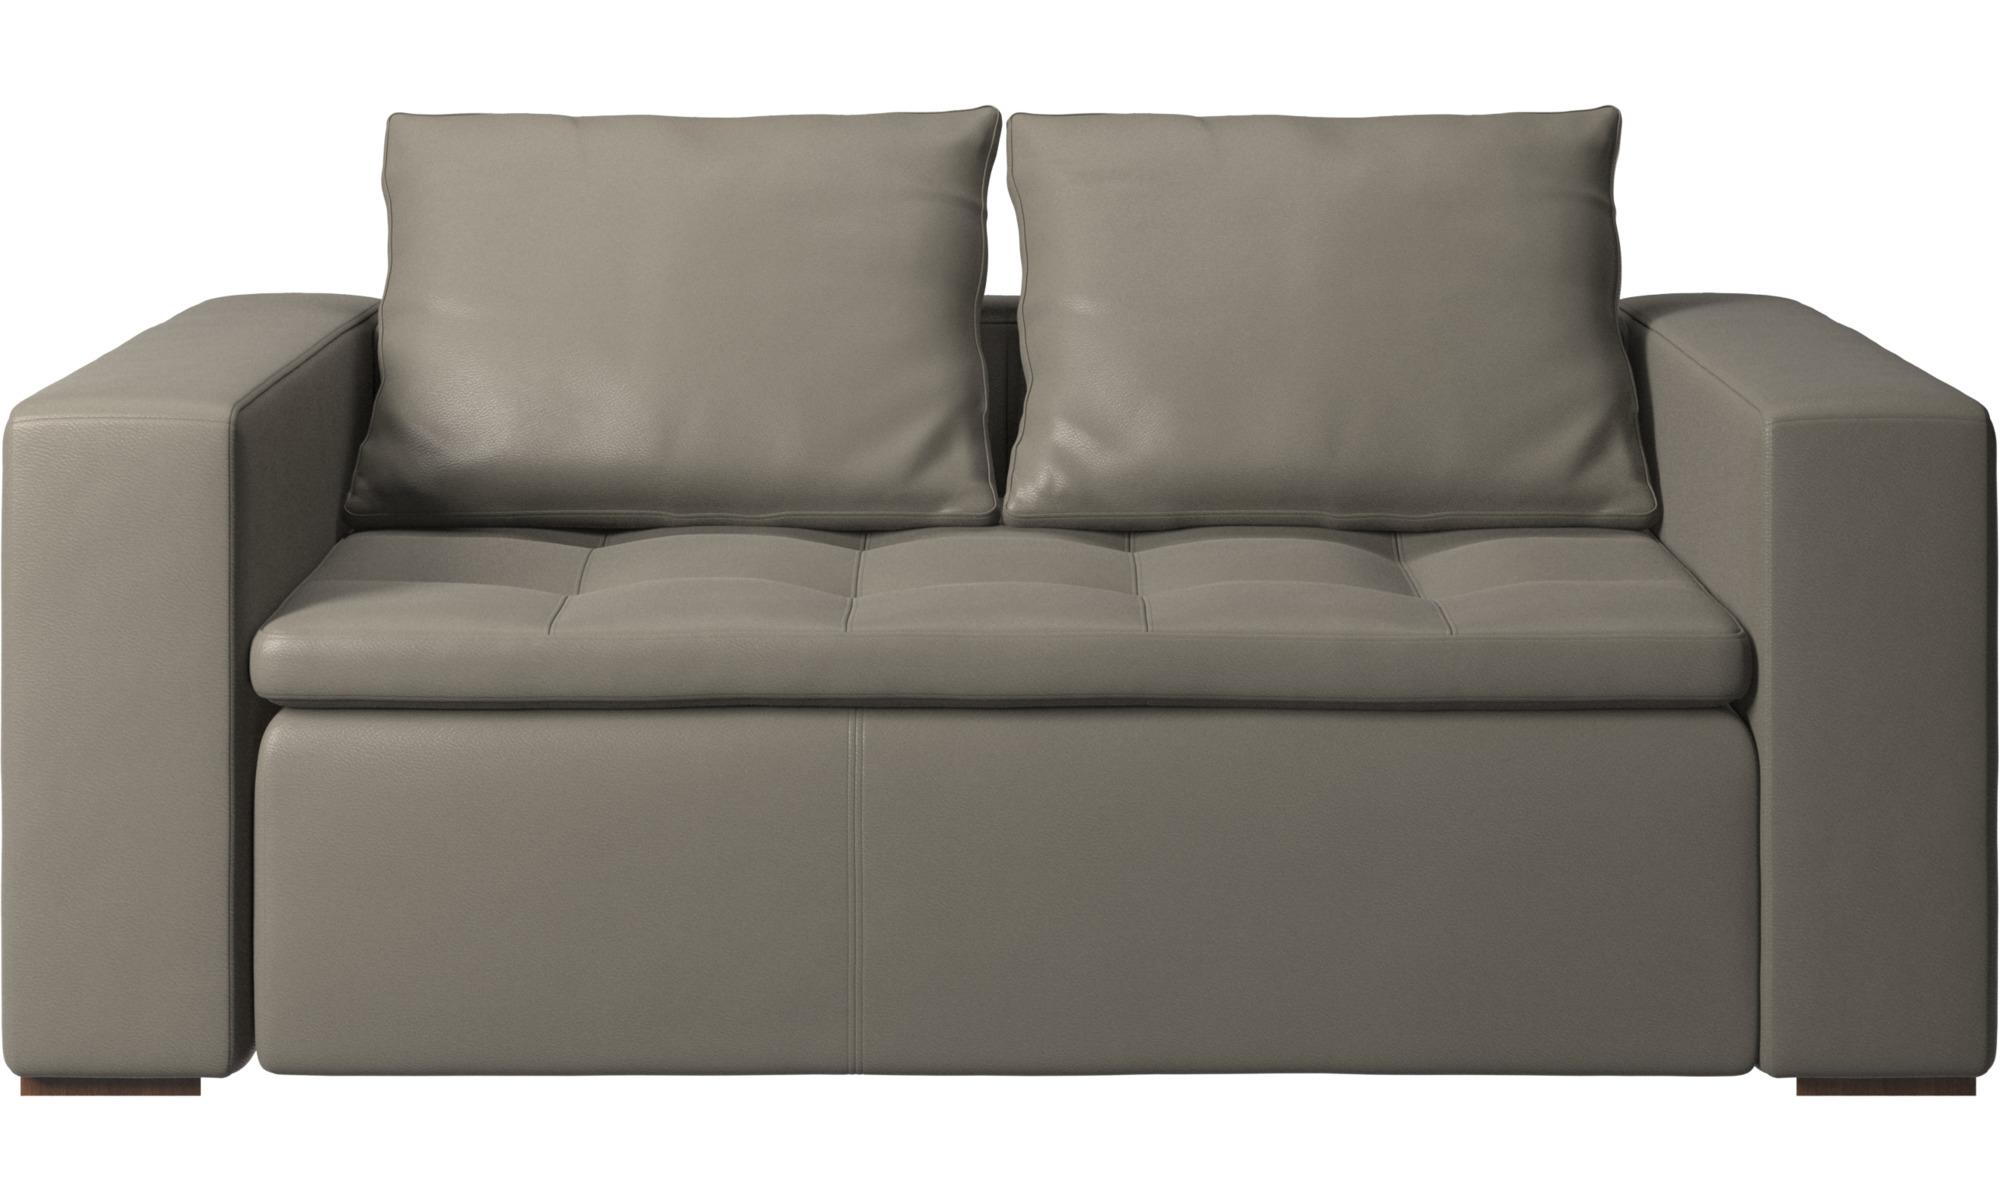 2 personers sofaer - Mezzo sofa - Grå - Læder